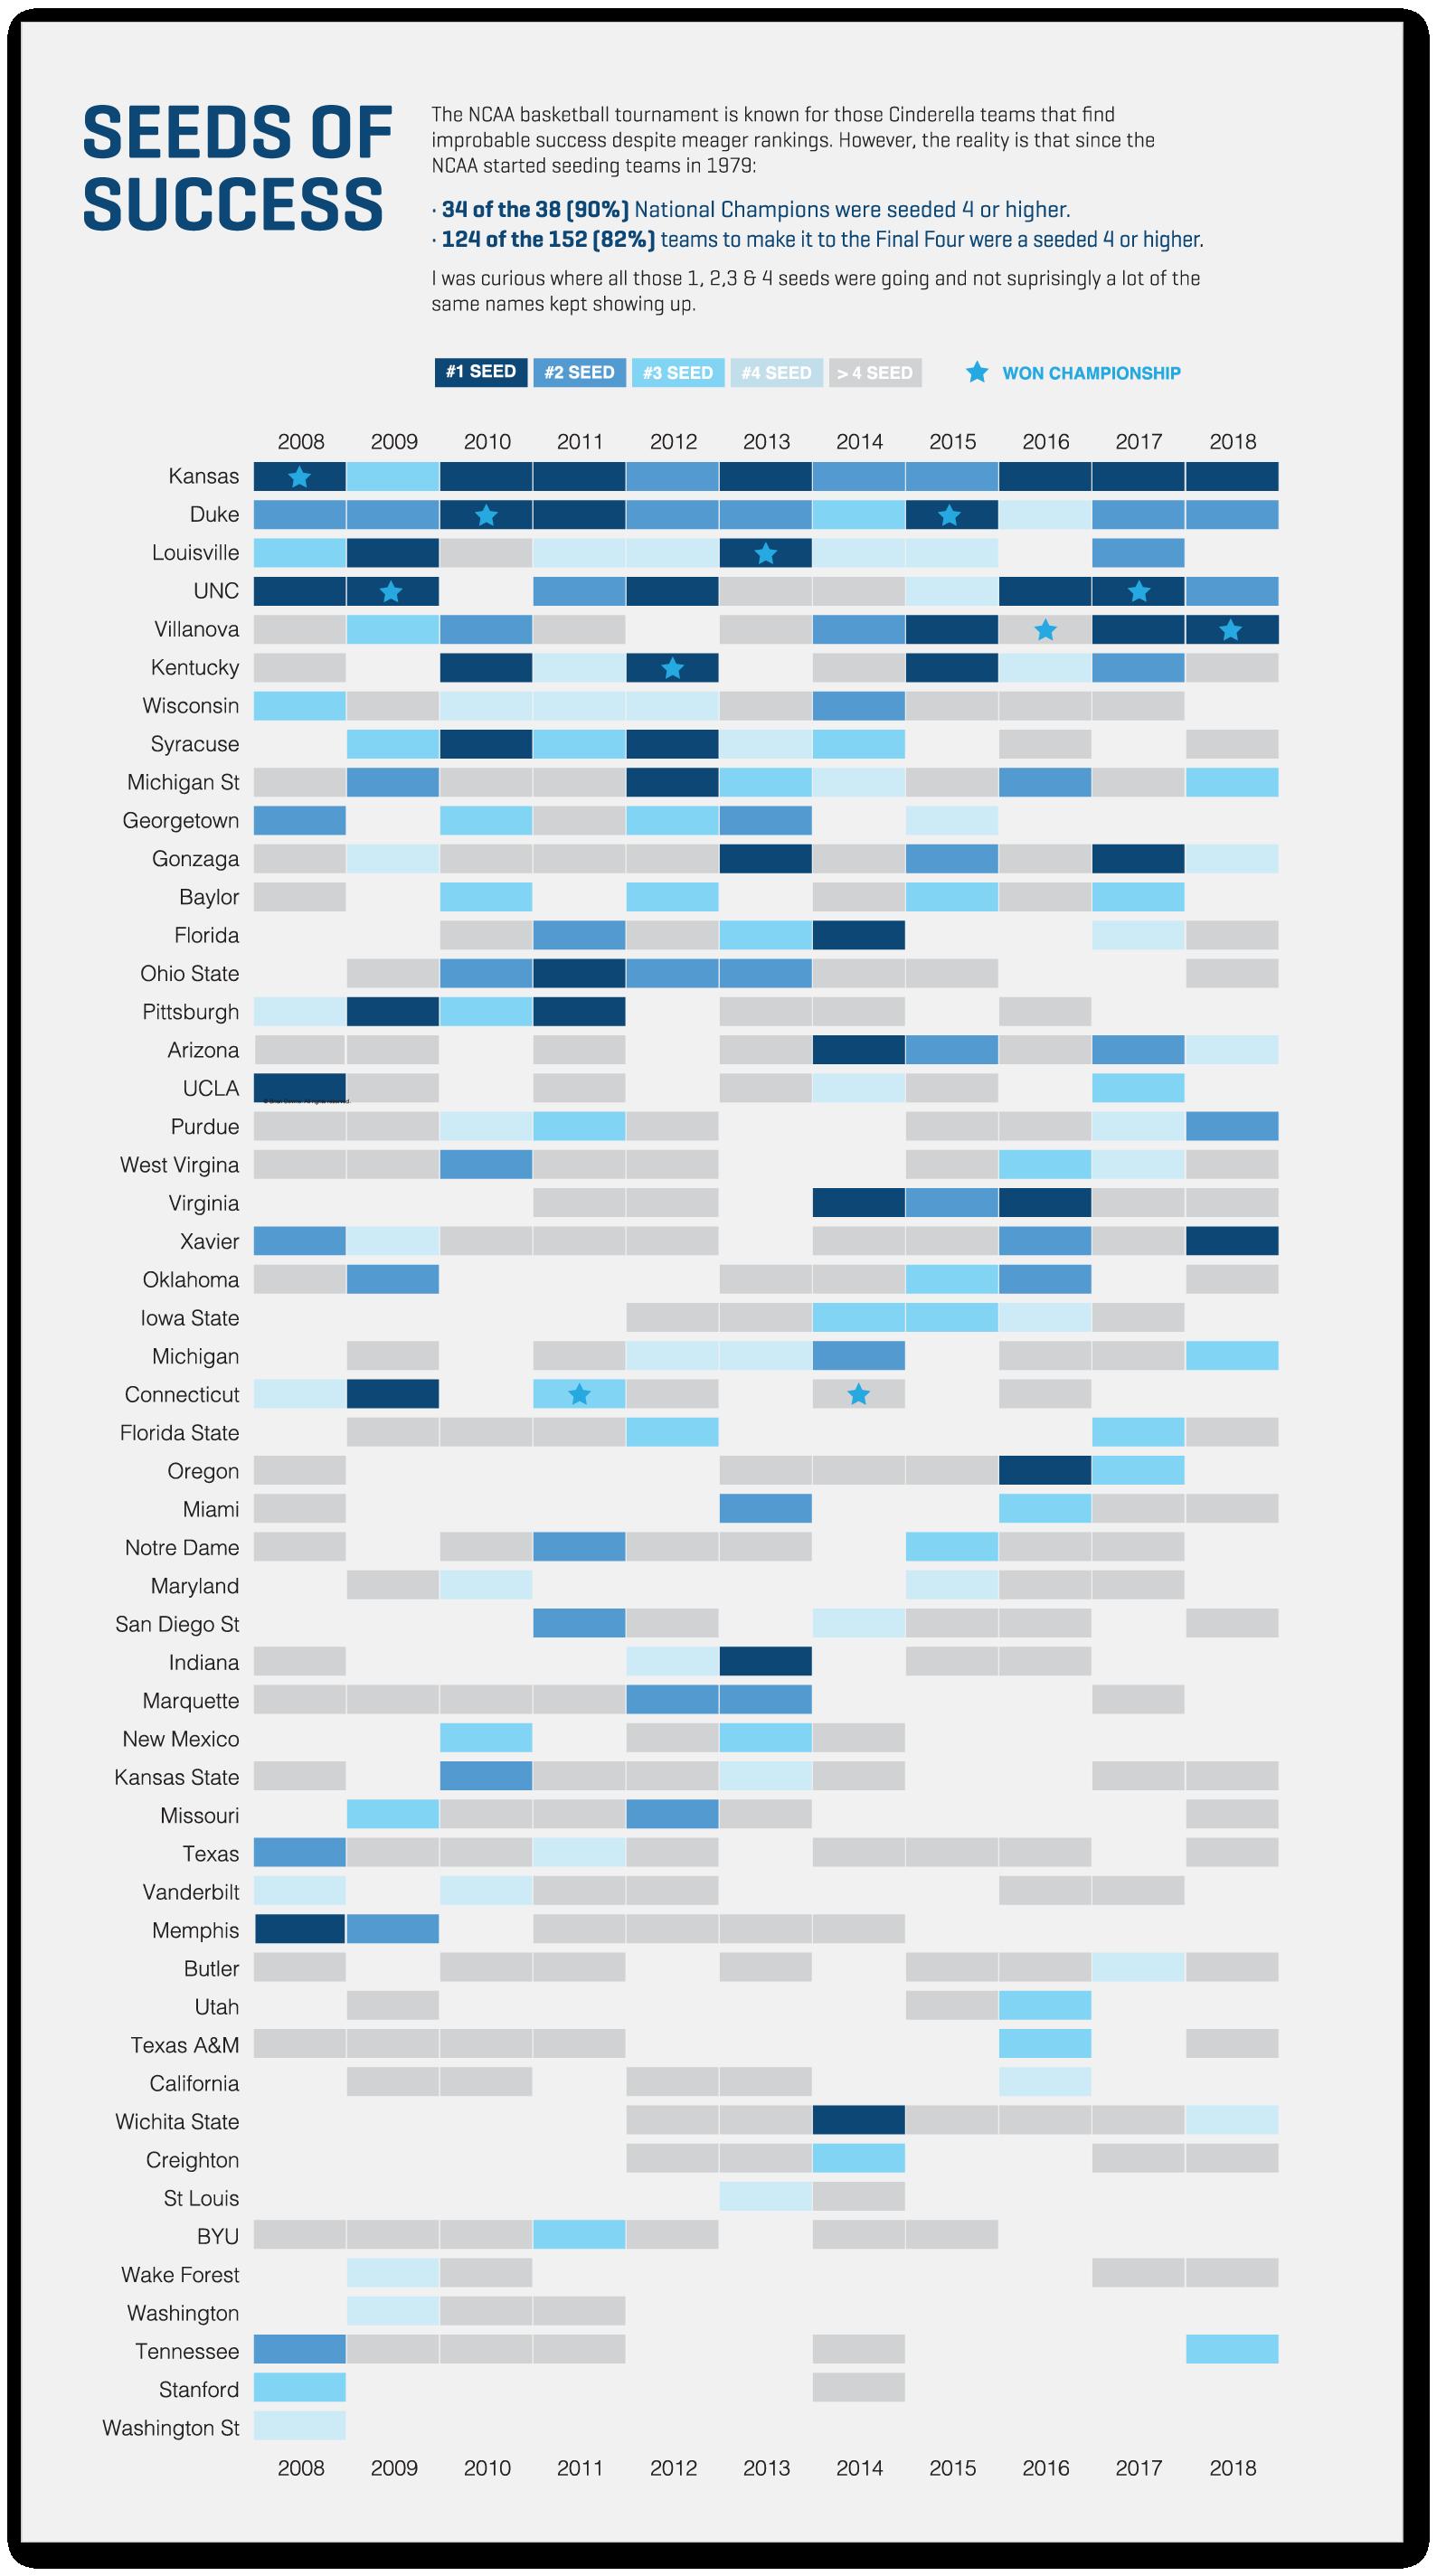 Seeds of Success Data Visualization